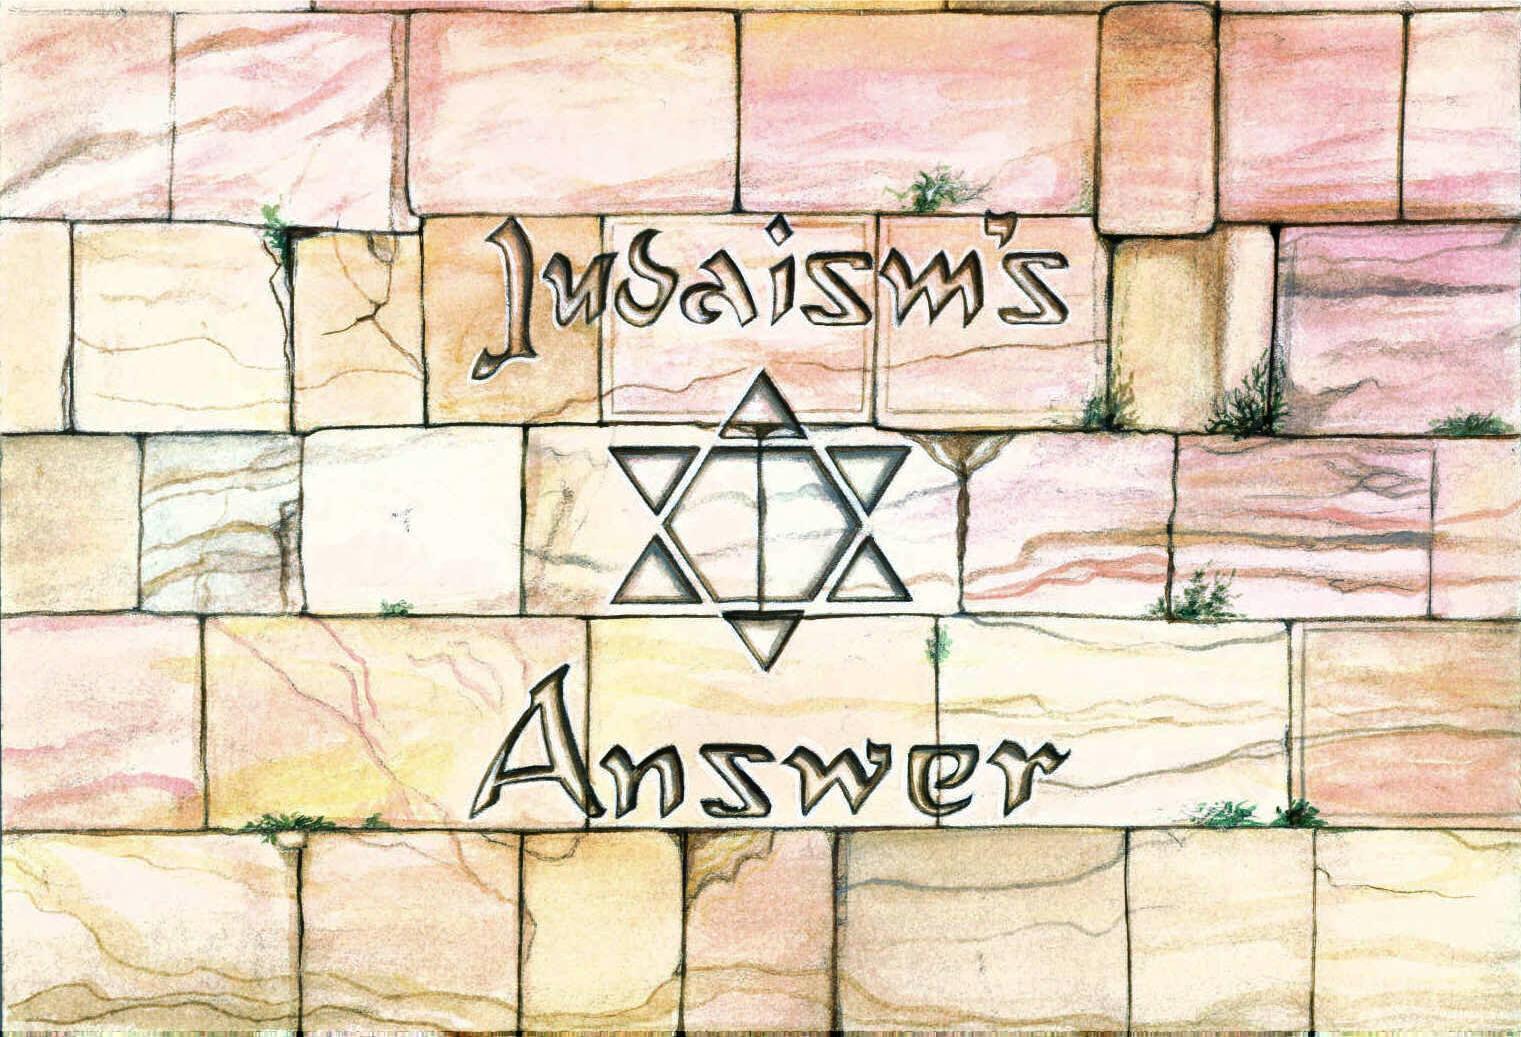 Judaism's Answer